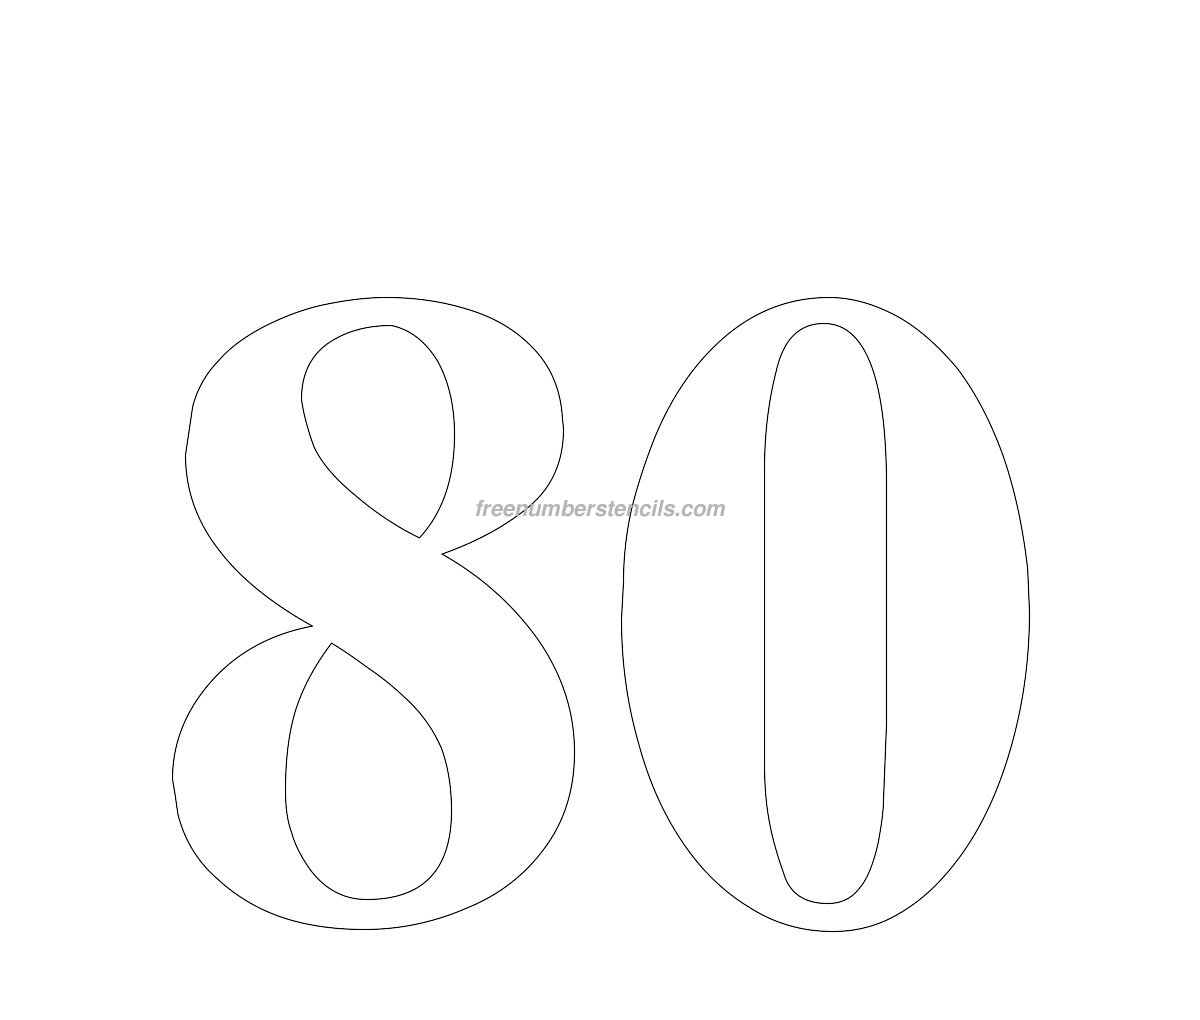 Free Huge 80 Number Stencil Freenumberstencils